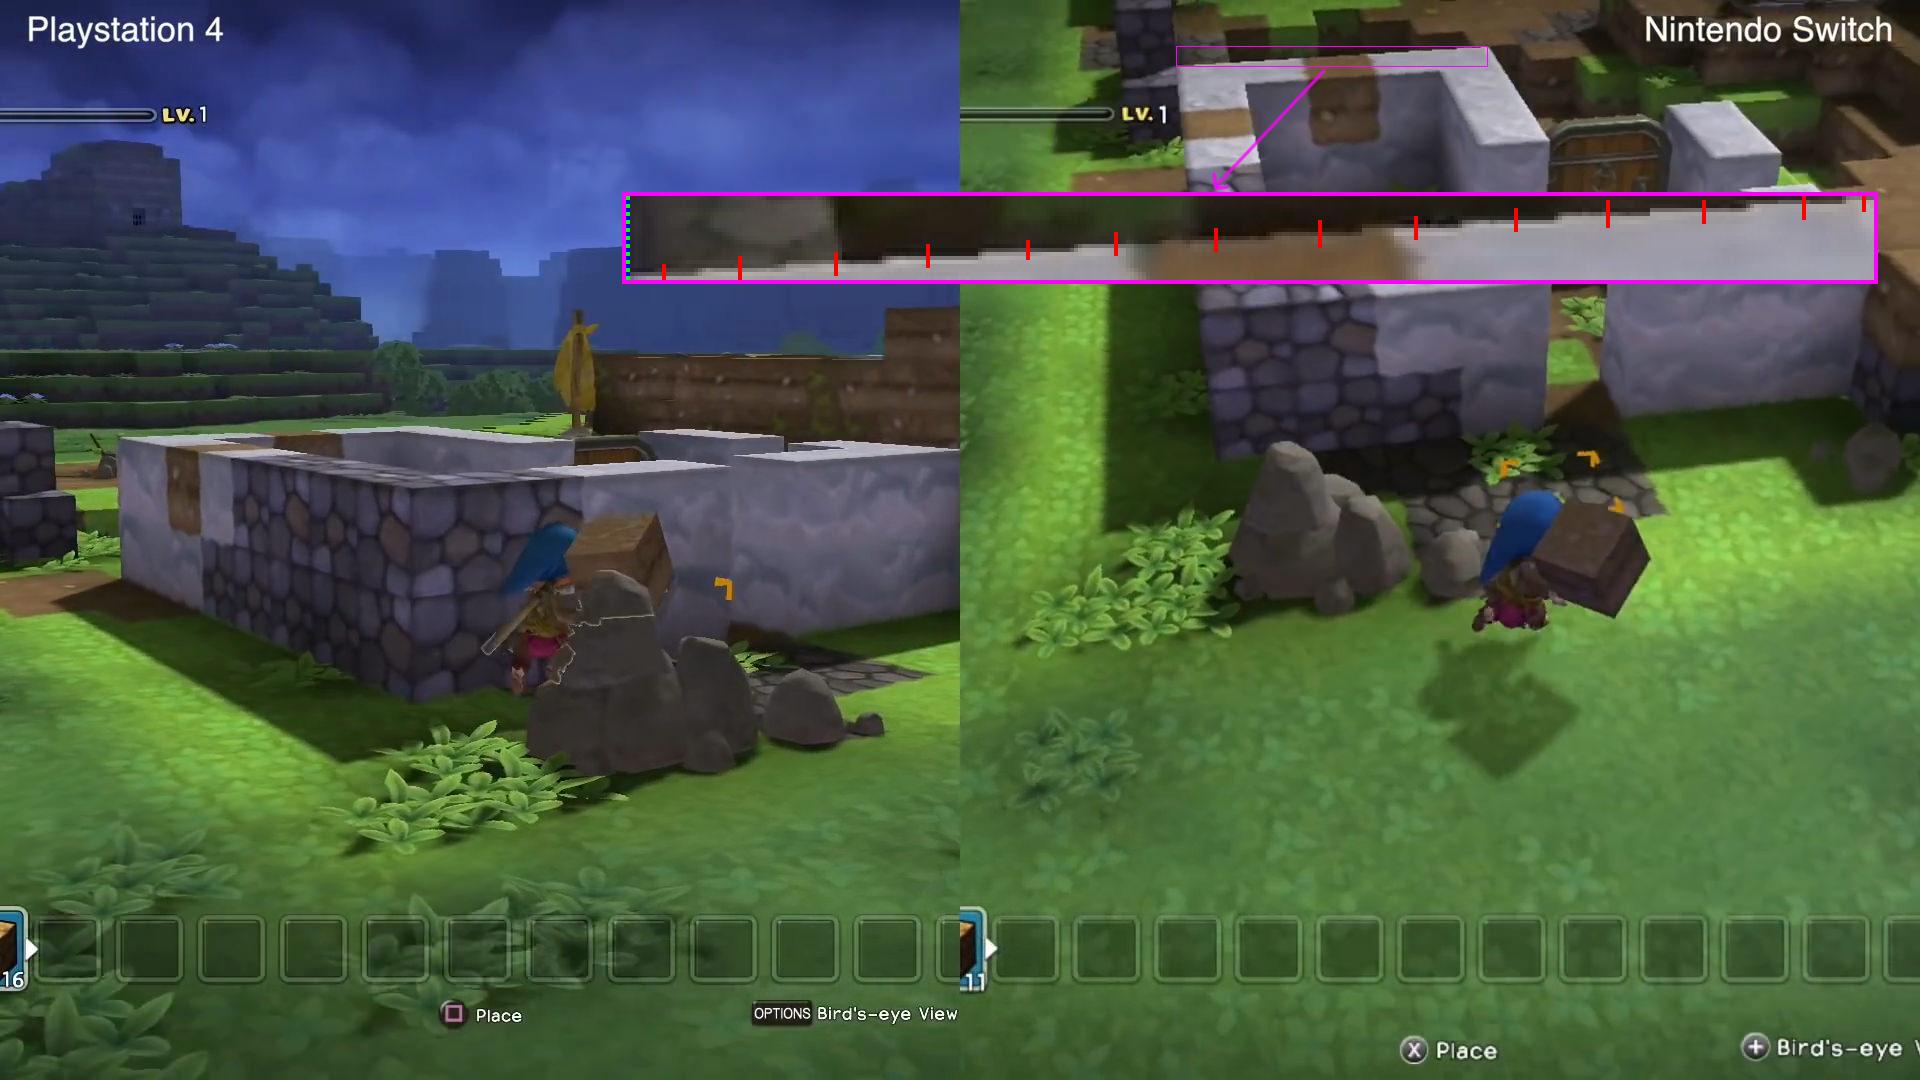 kywyEnrwyZ6Hv - DQB ドラゴンクエストビルダーズ比較動画 PS4 switch